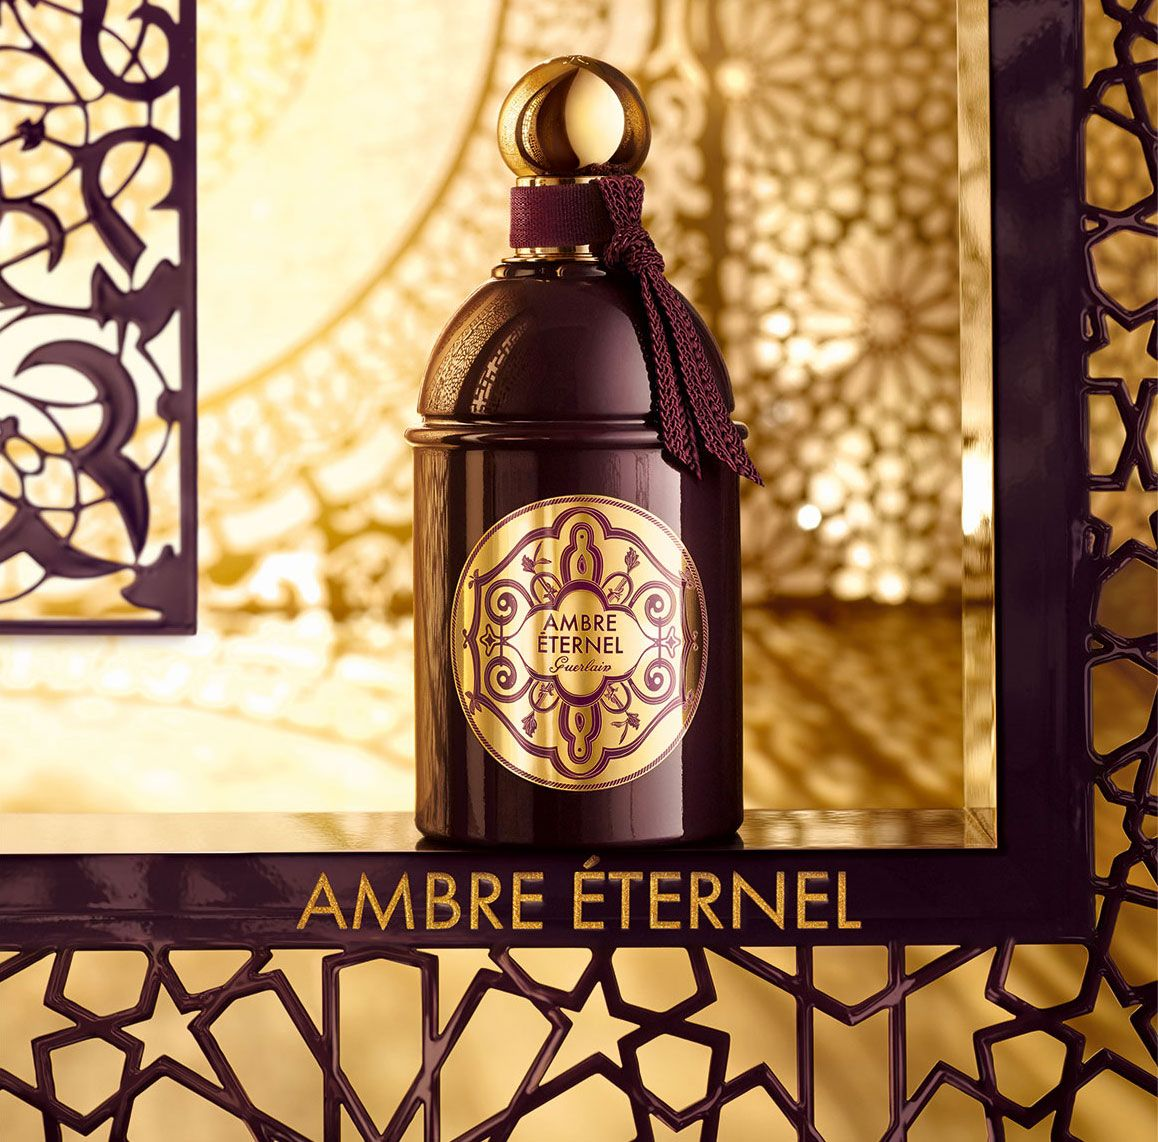 Ambre Eternel Guerlain - Поиск в Google